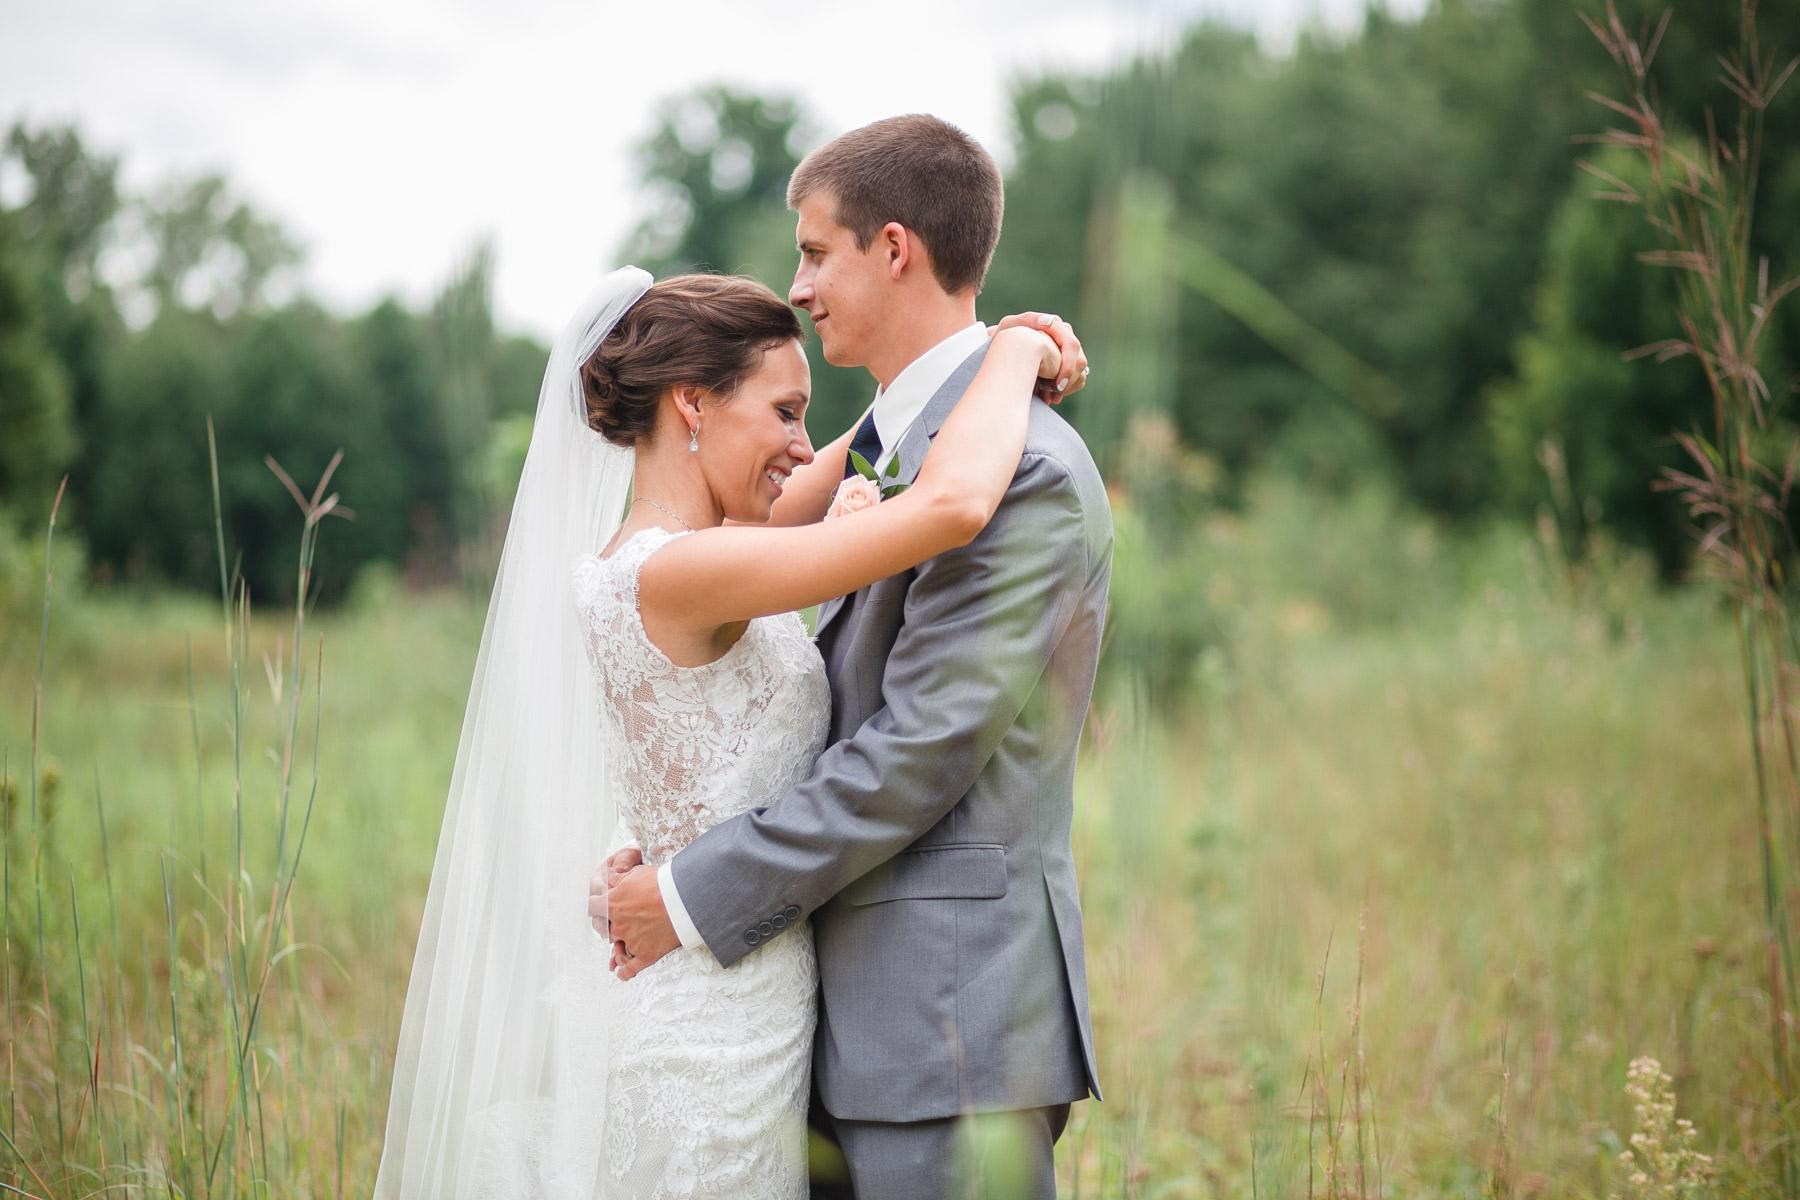 wildwood-park-wedding-photos-66.jpg